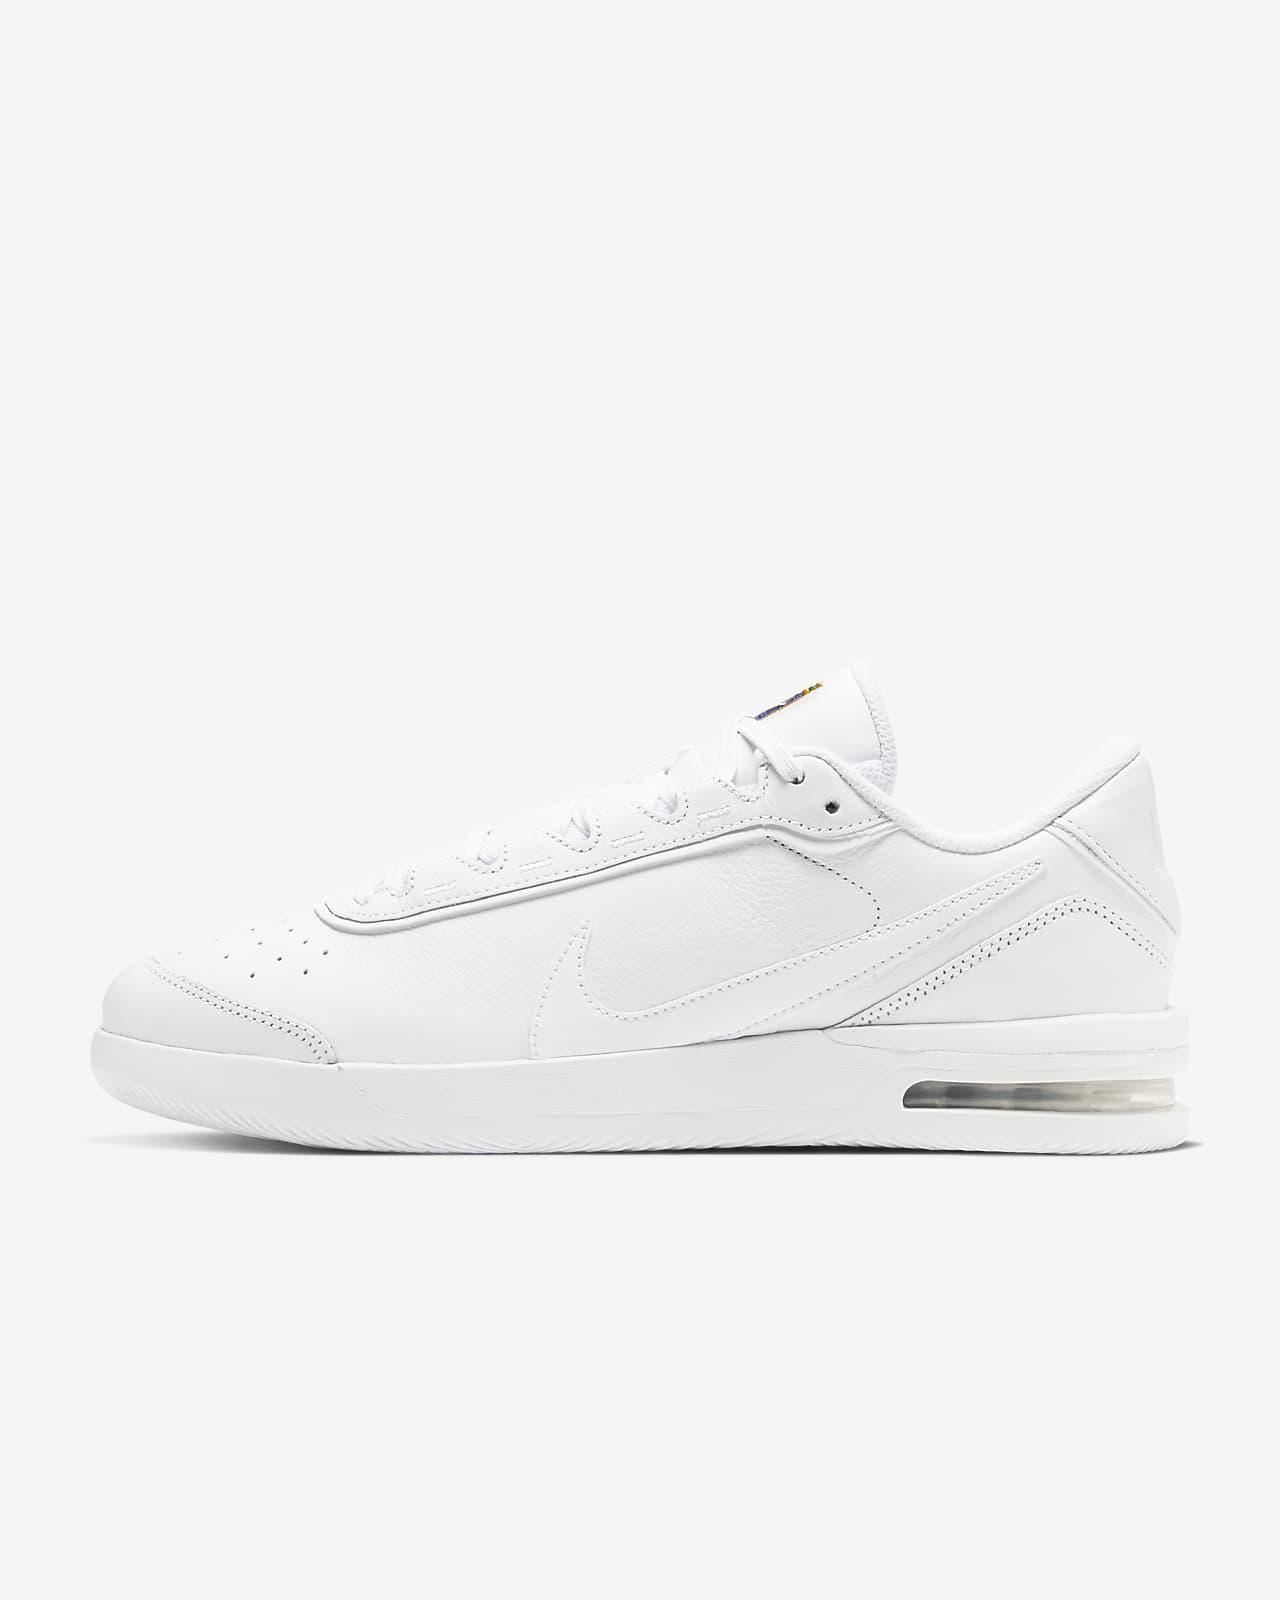 Scarpa da tennis NikeCourt Air Max Vapor Wing Premium - Uomo